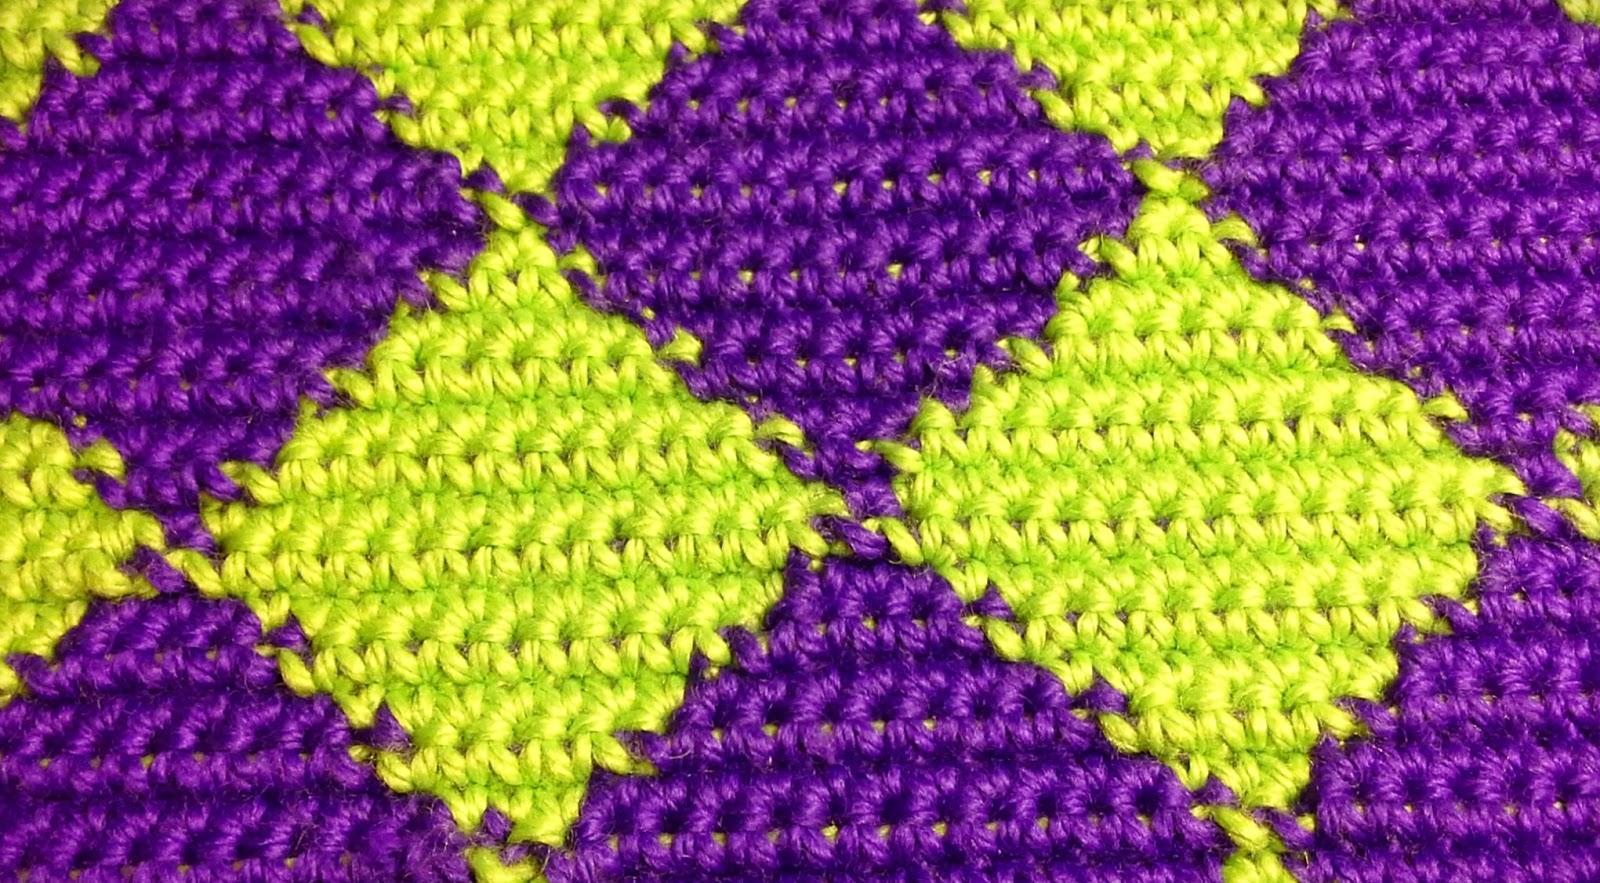 Tapestry, tapiz en crochet - taller para principiantes, domingo 13 ...